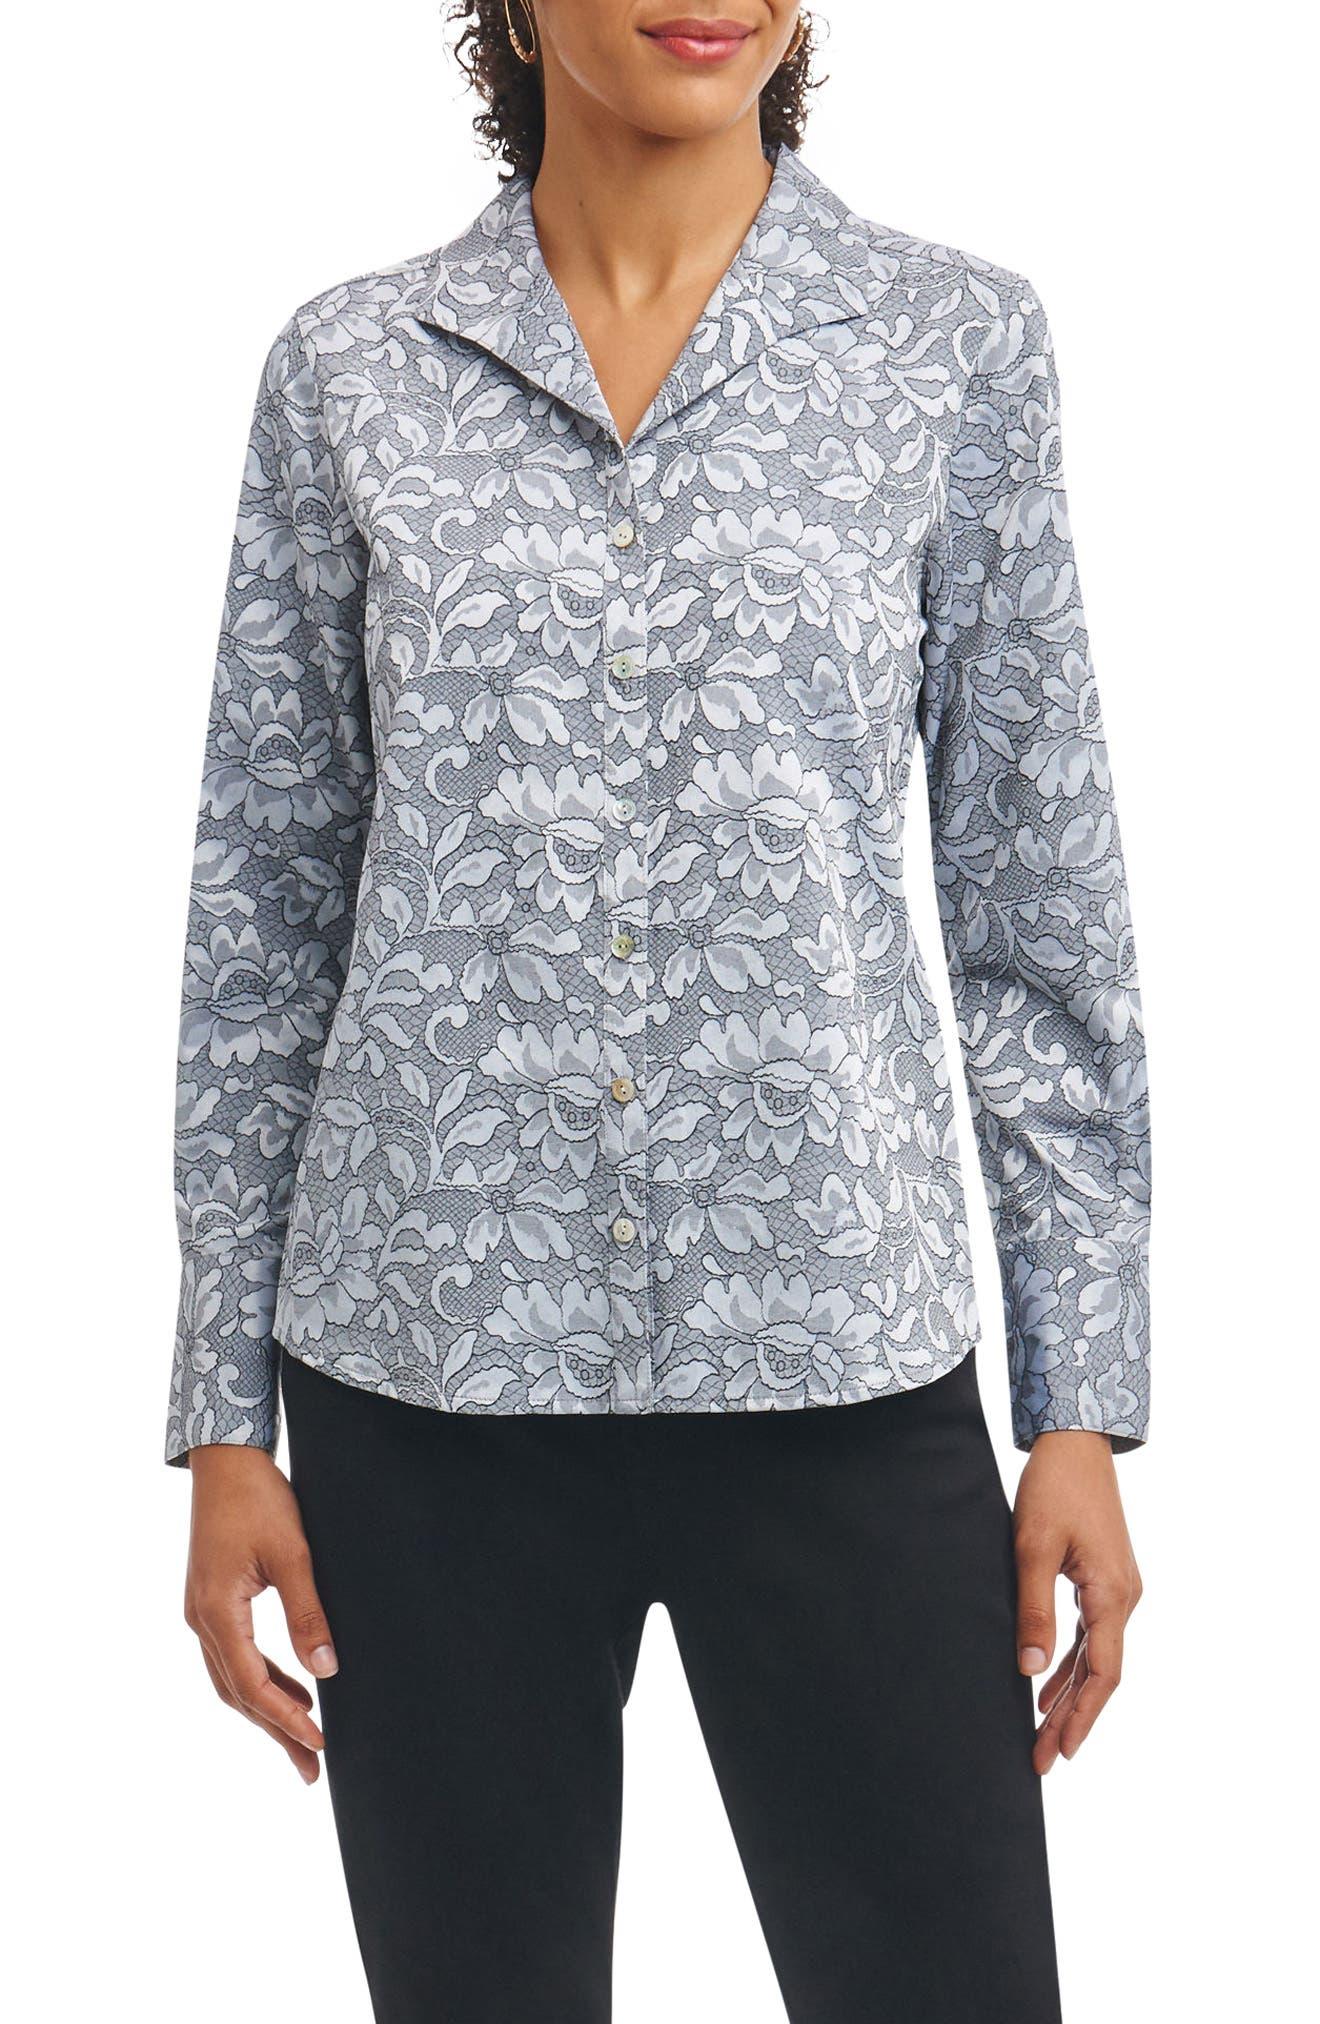 Rhonda Wrinkle Free Lace Jacquard Shirt,                         Main,                         color, 037